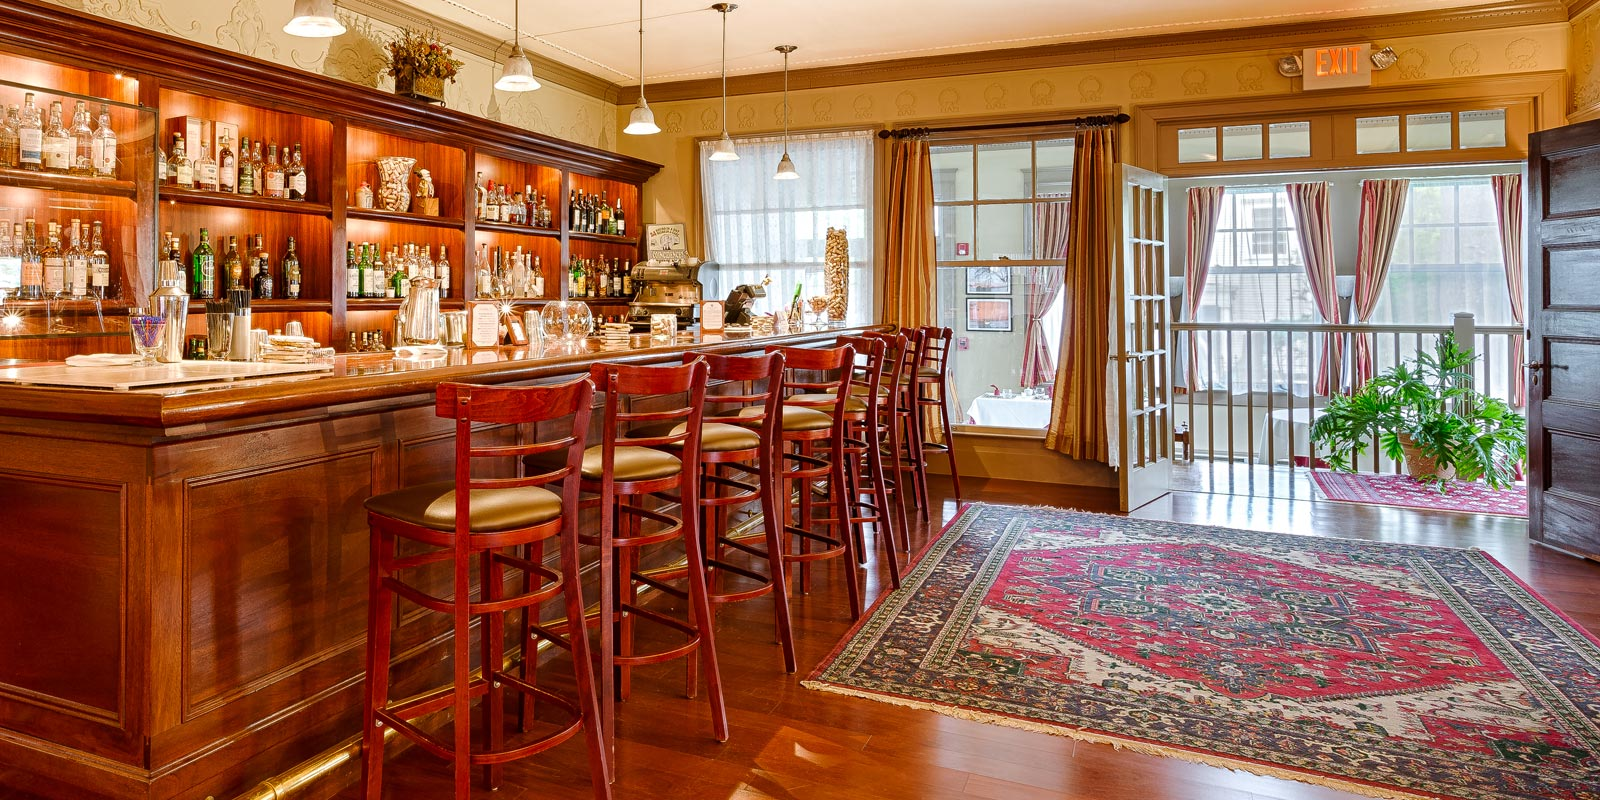 Enjoy A Memorable Berkshire Experience In Scenic Historic Estate Setting